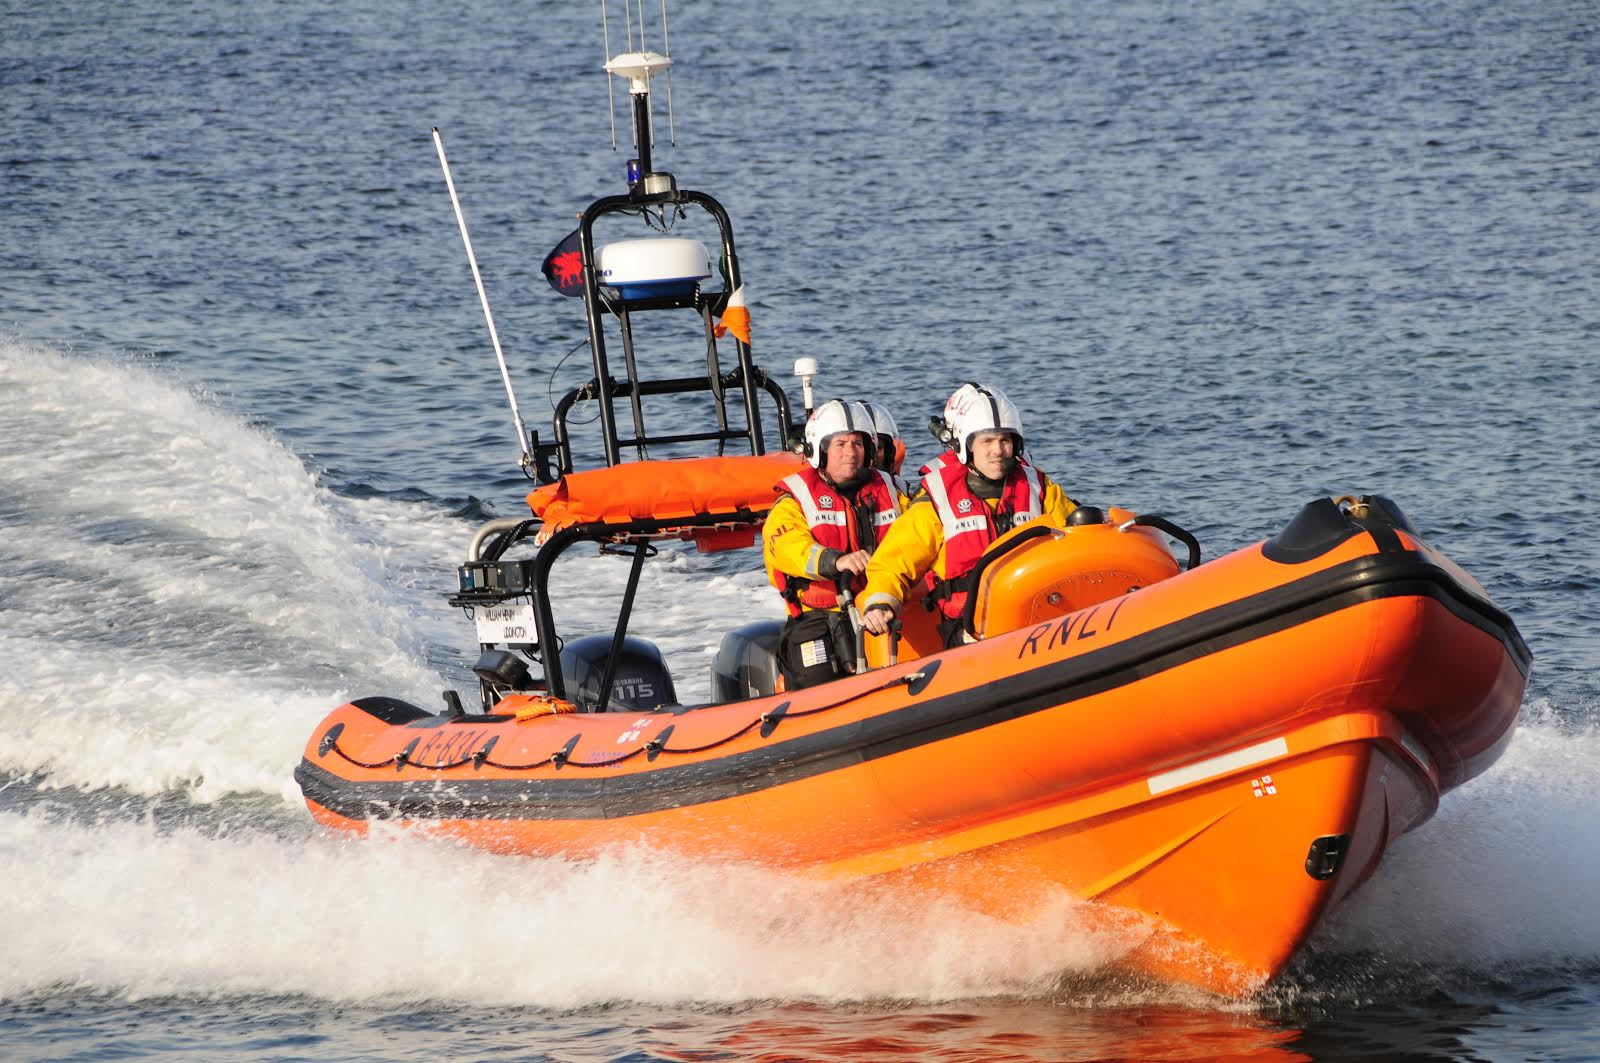 Bundoran Lifeboat